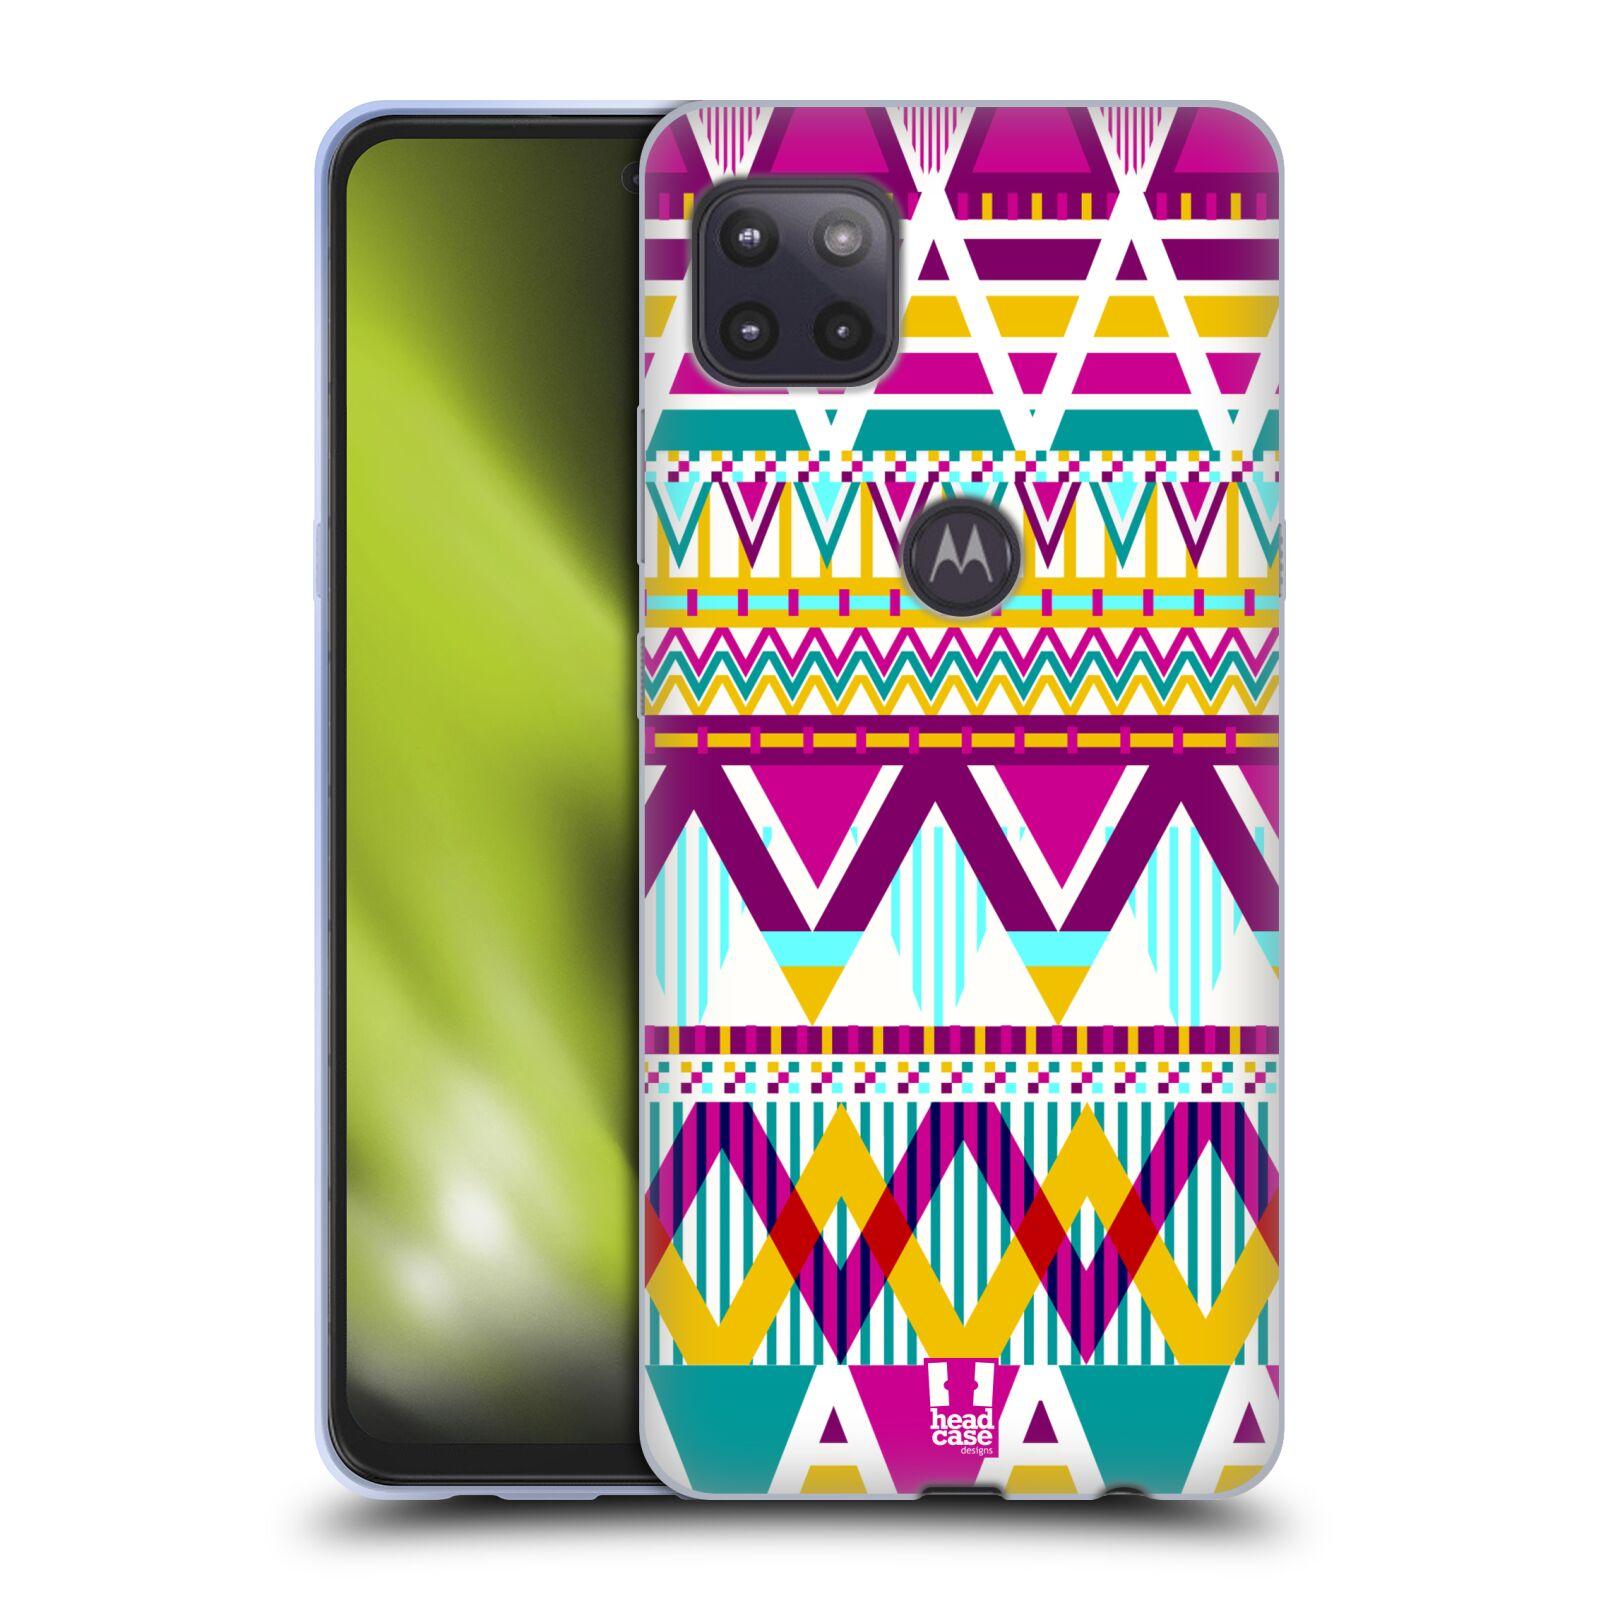 Silikonové pouzdro na mobil Motorola Moto G 5G - Head Case - AZTEC SUGARED